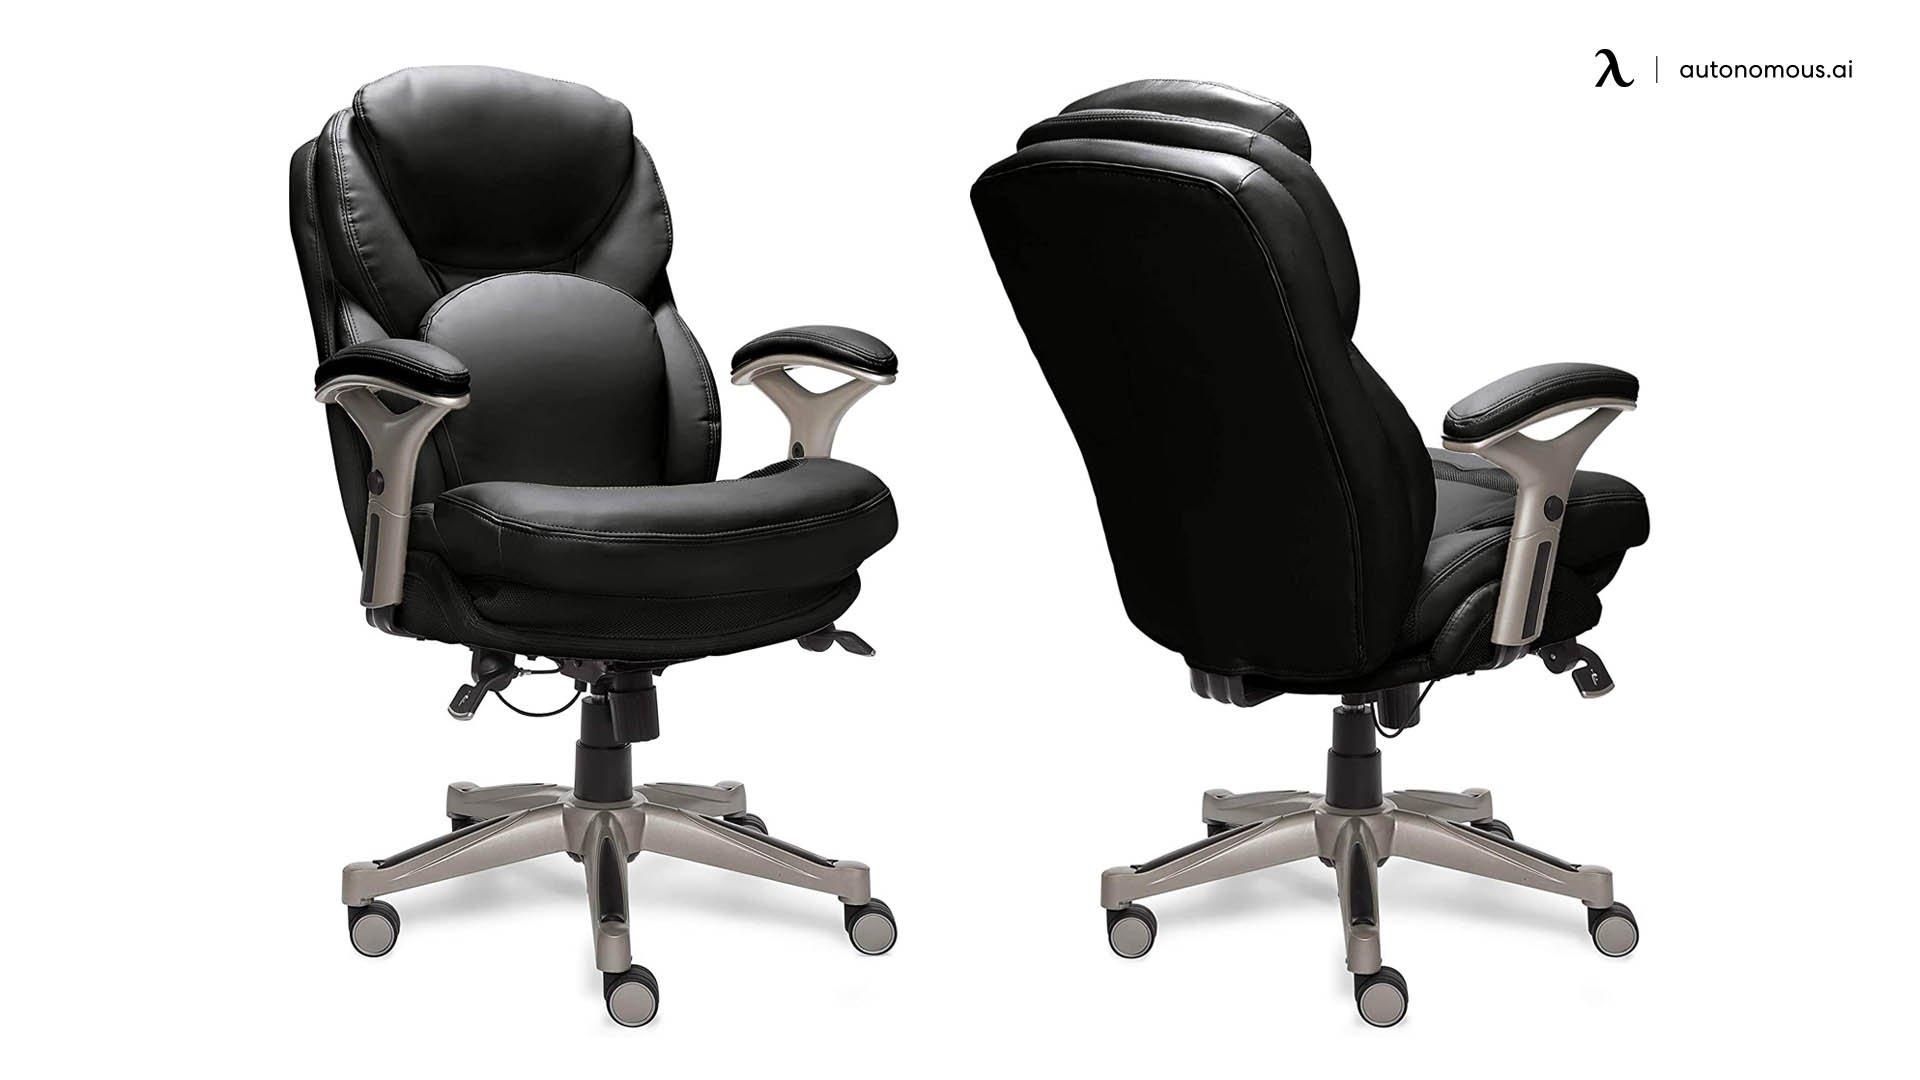 serta ergonomic office chair